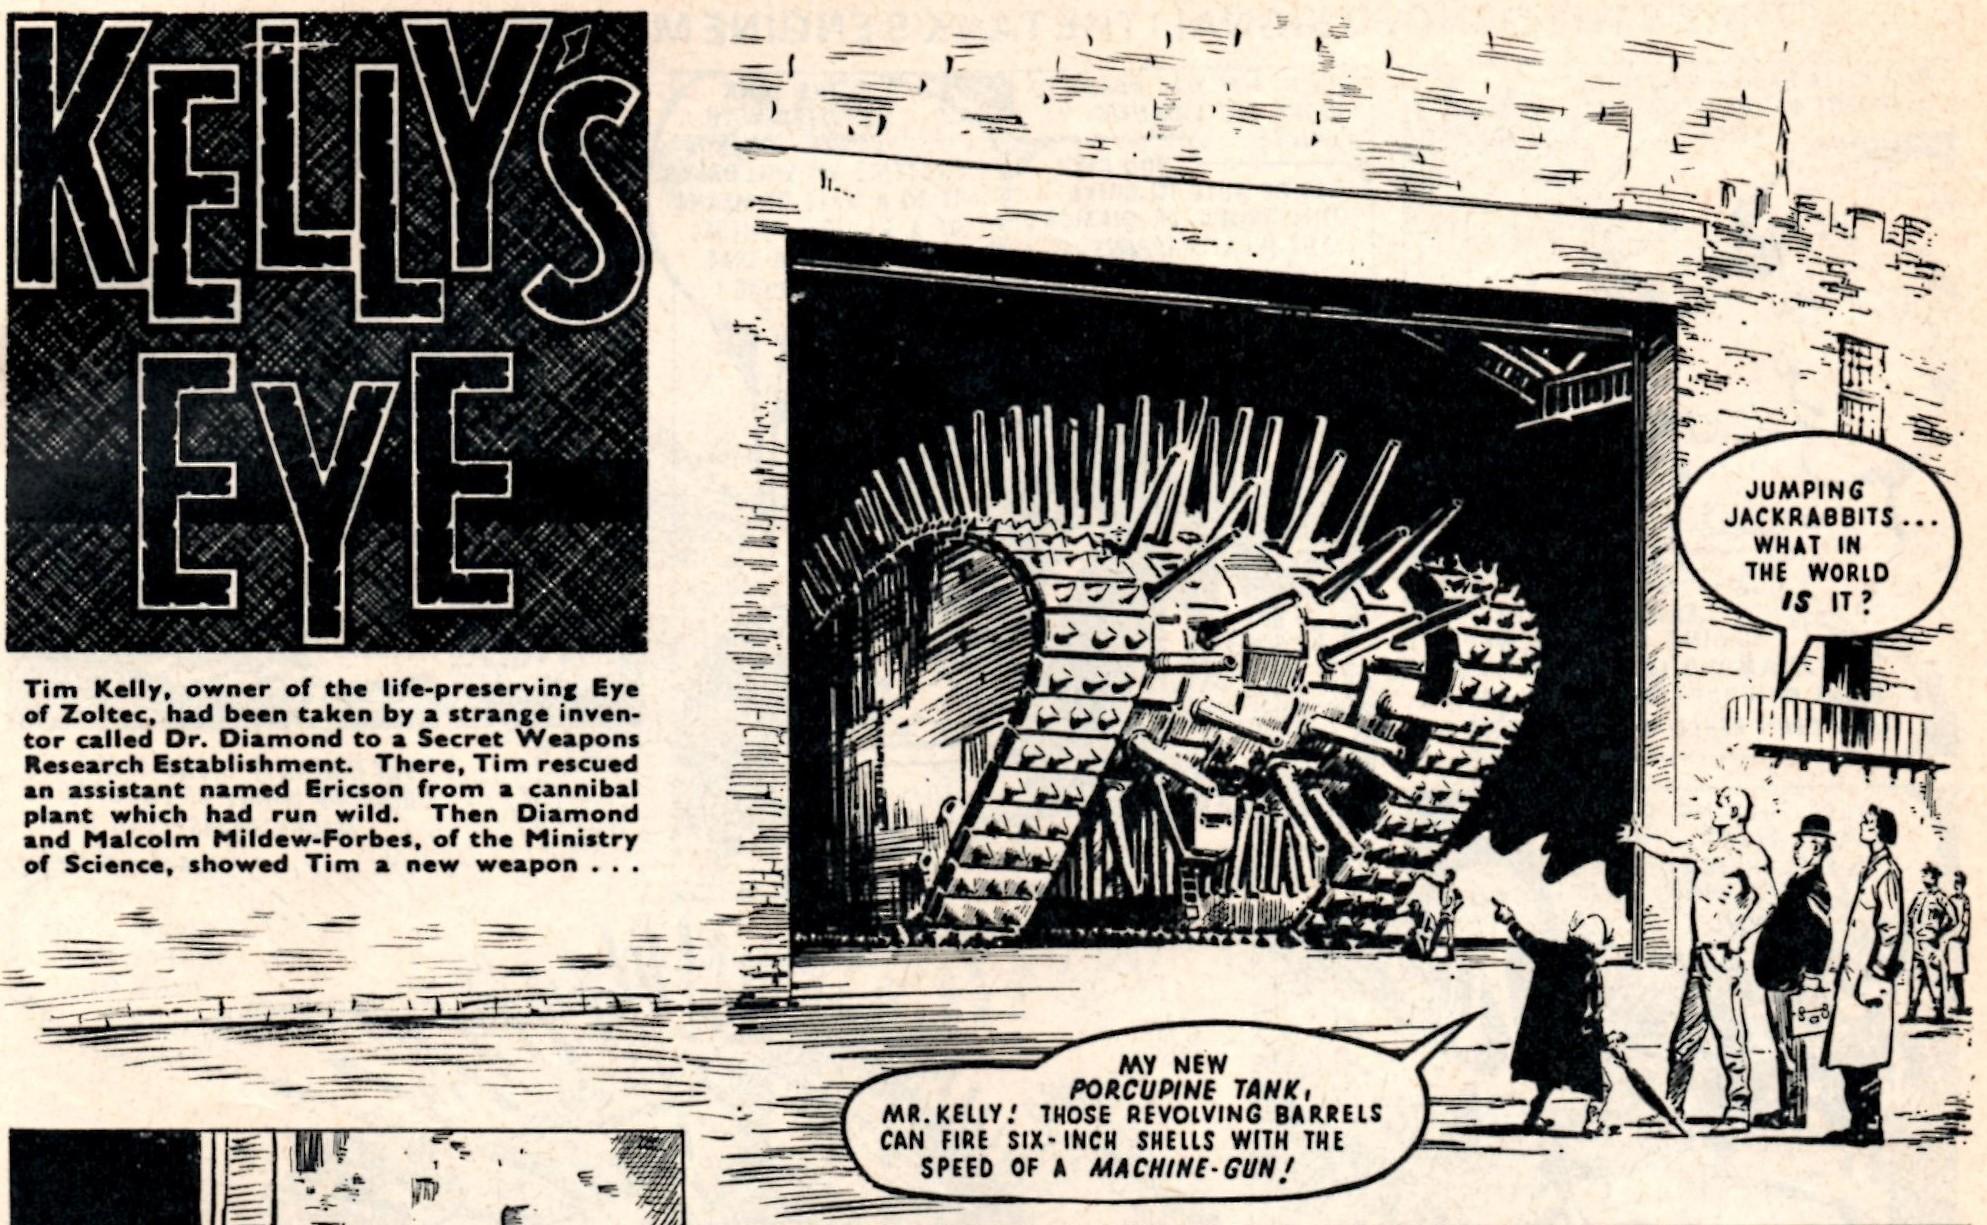 Kelly's Eye: Solano Lopez (artist); reprinted from Valiant